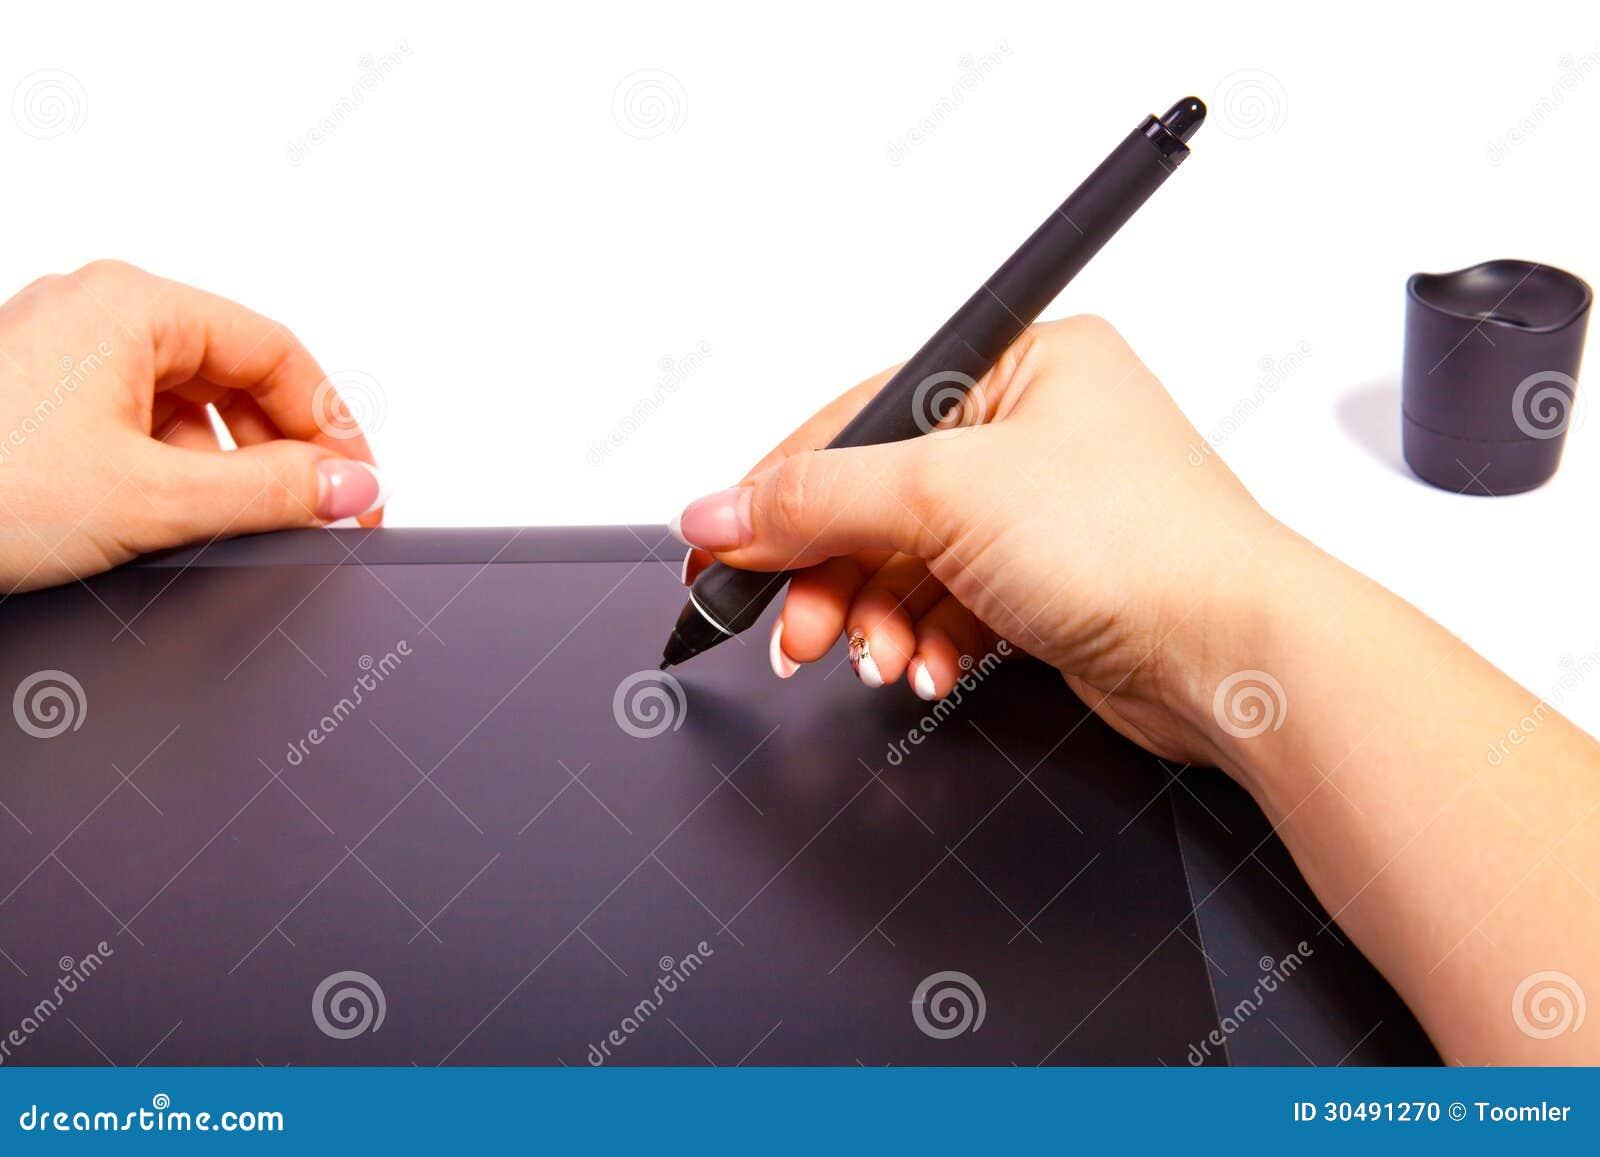 tablette graphique format a4 stock photo image 30491270. Black Bedroom Furniture Sets. Home Design Ideas